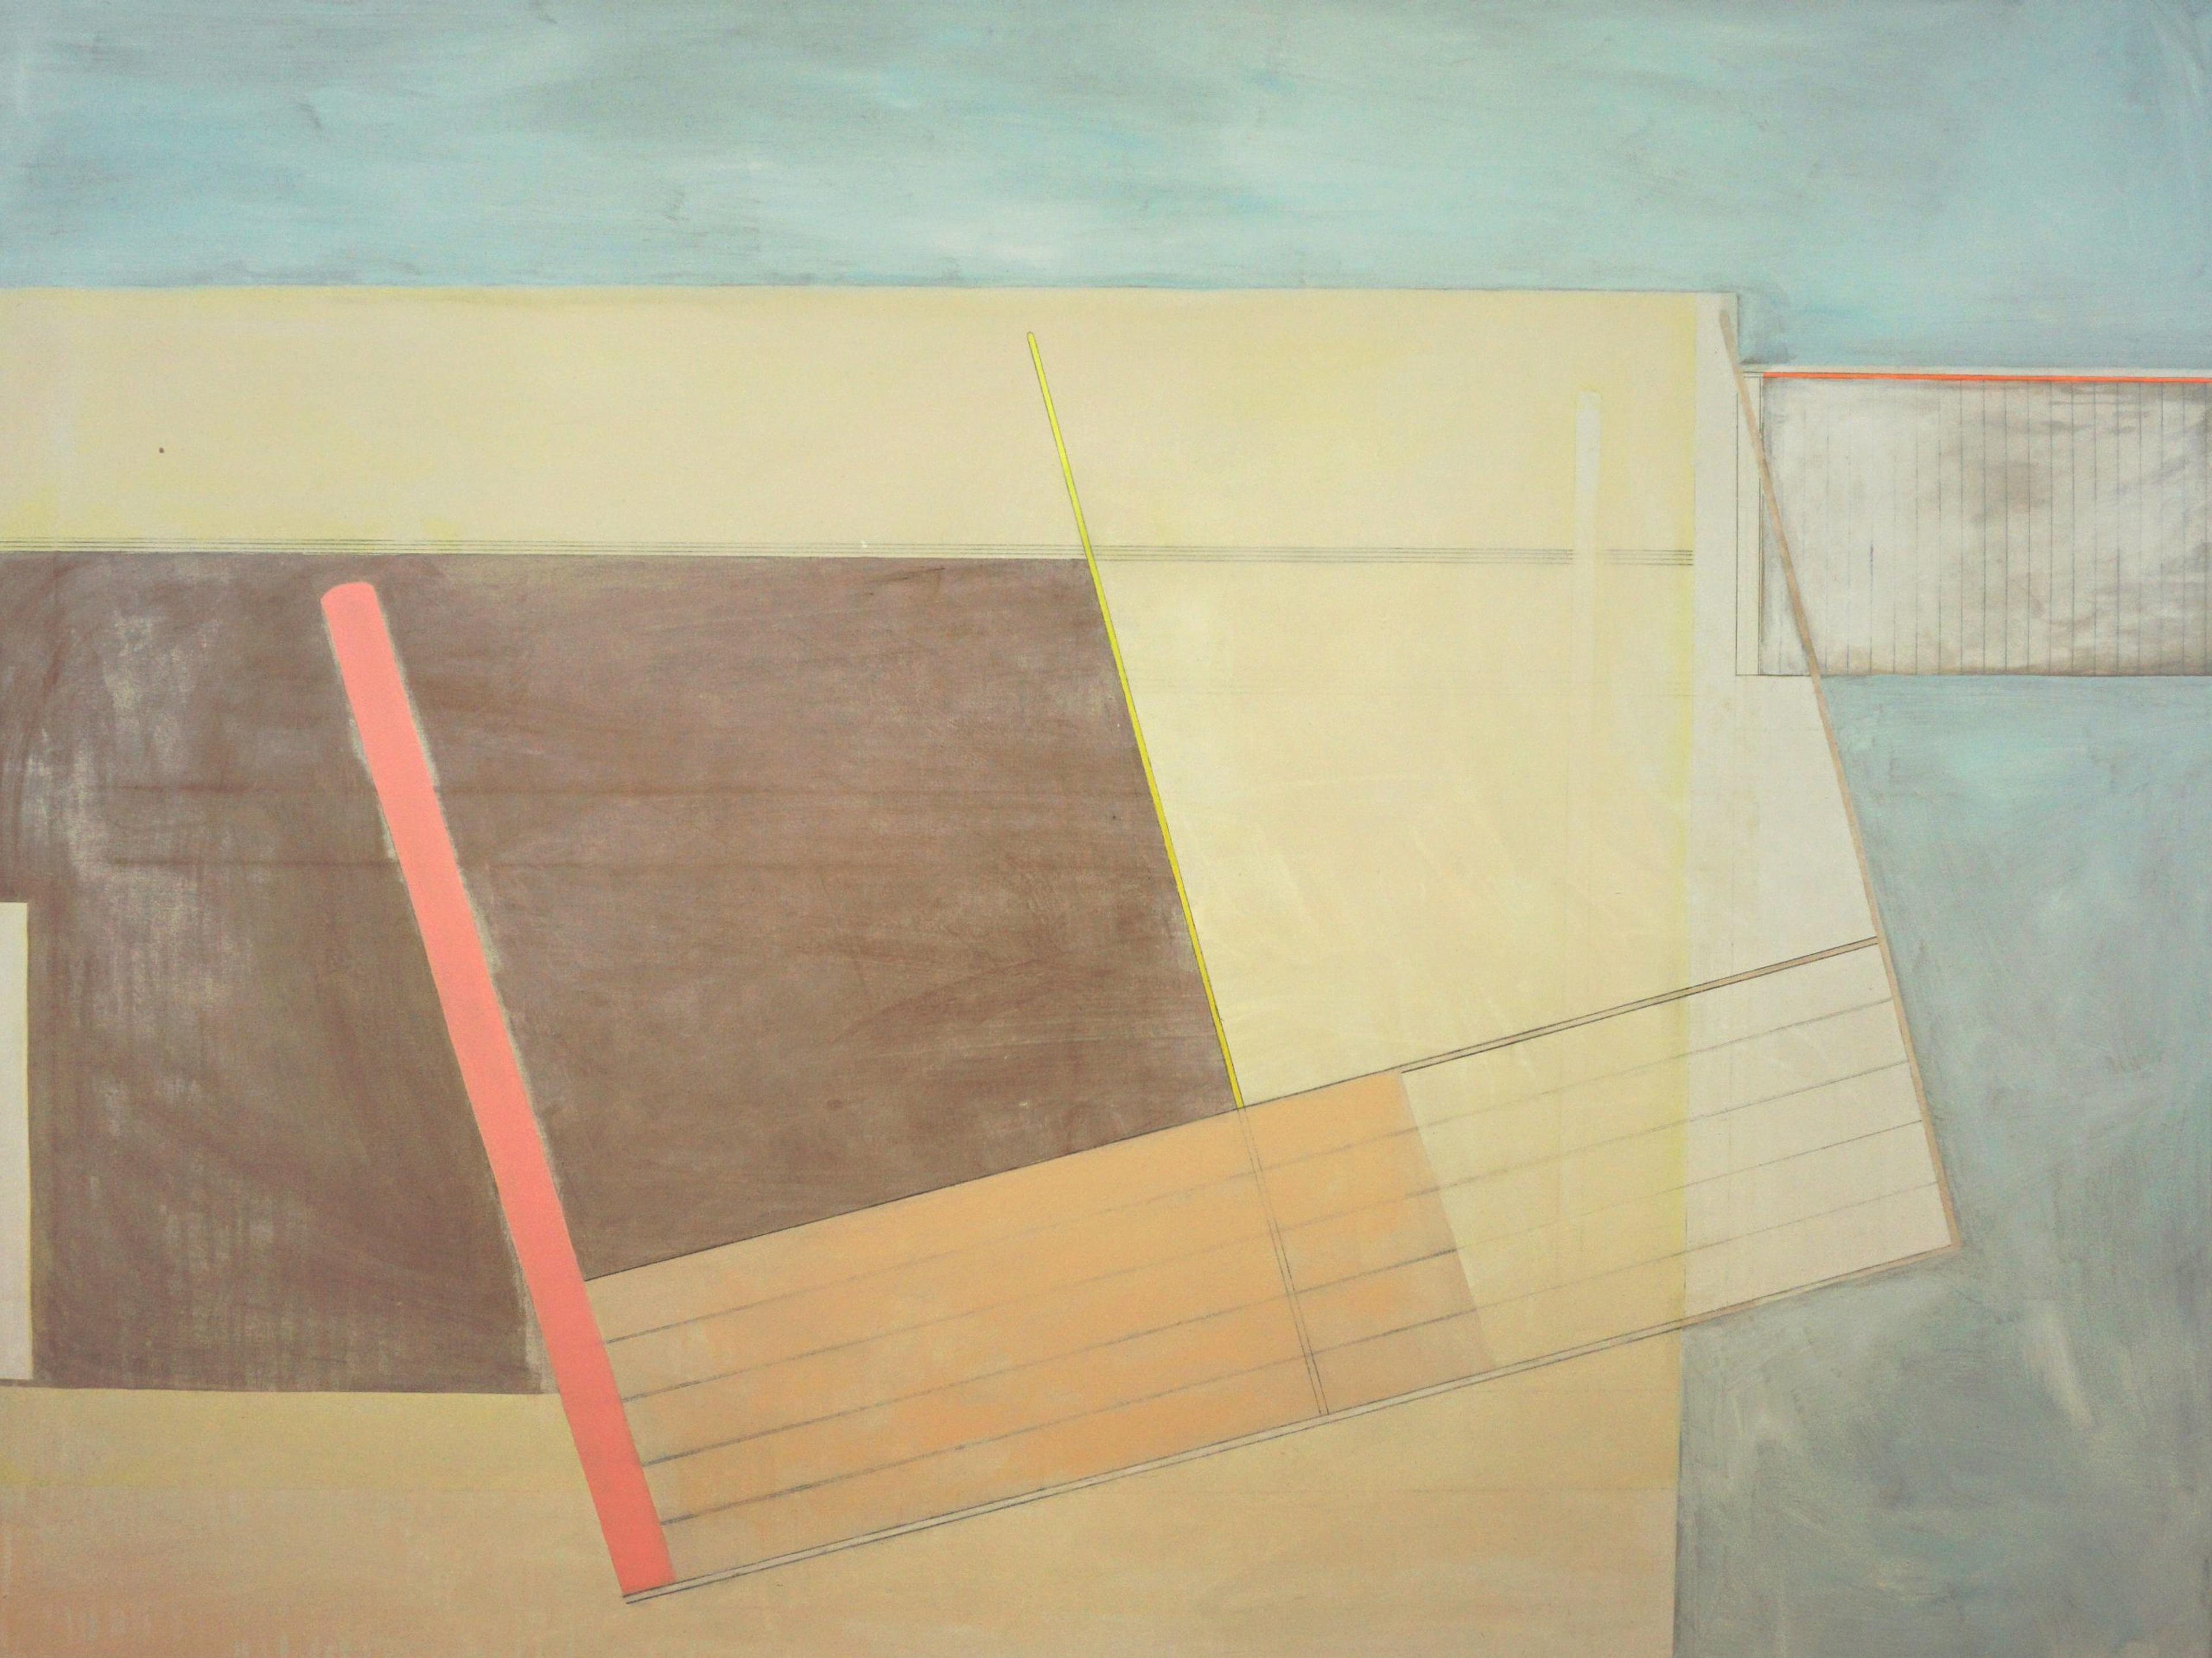 artwork UN-Ort II by Petra Gell